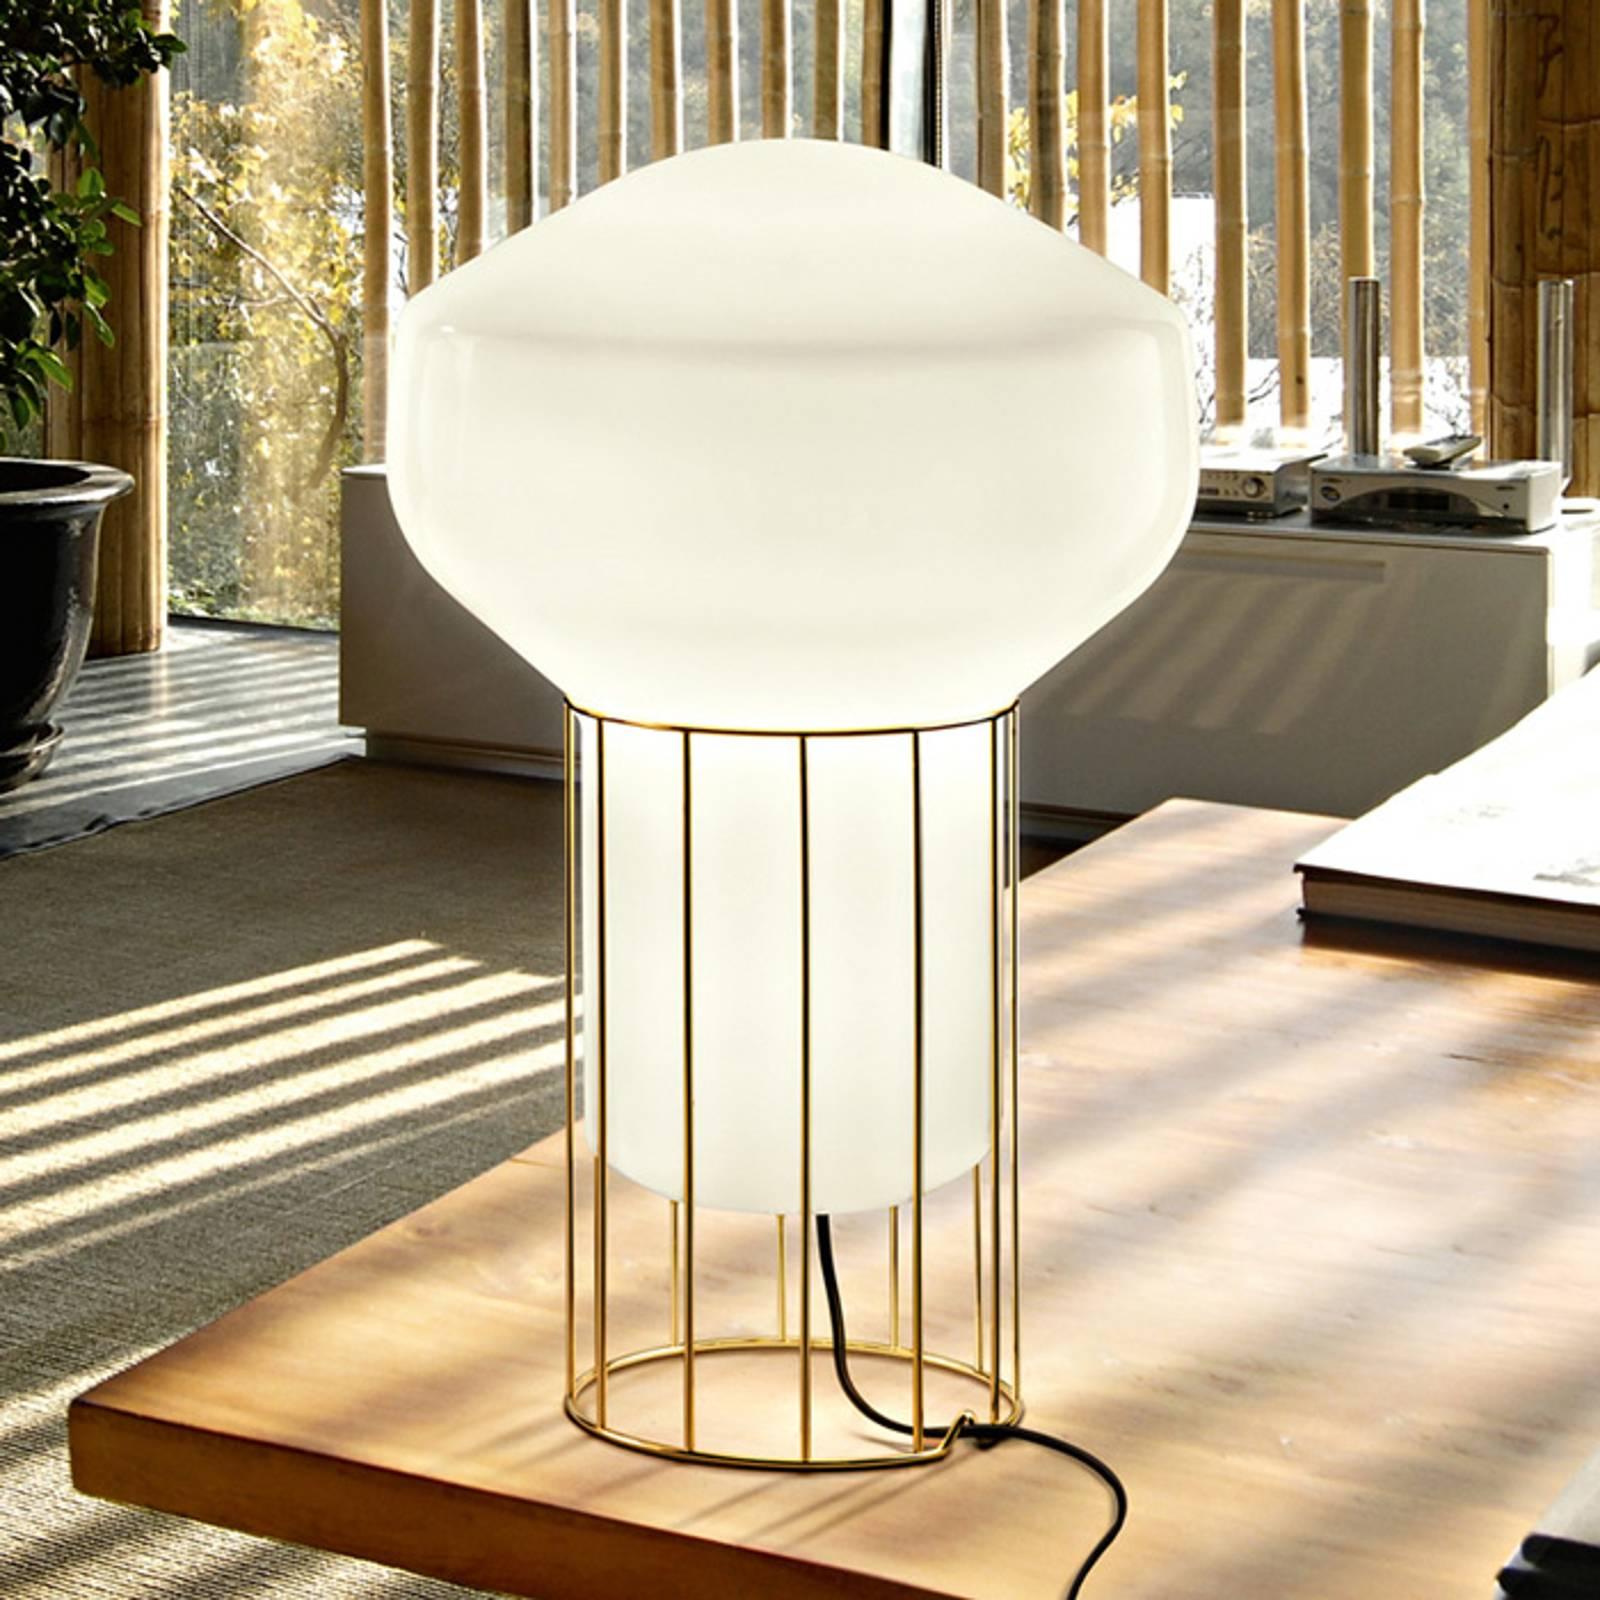 Design tafellamp Aérostat met messing voet 33cm